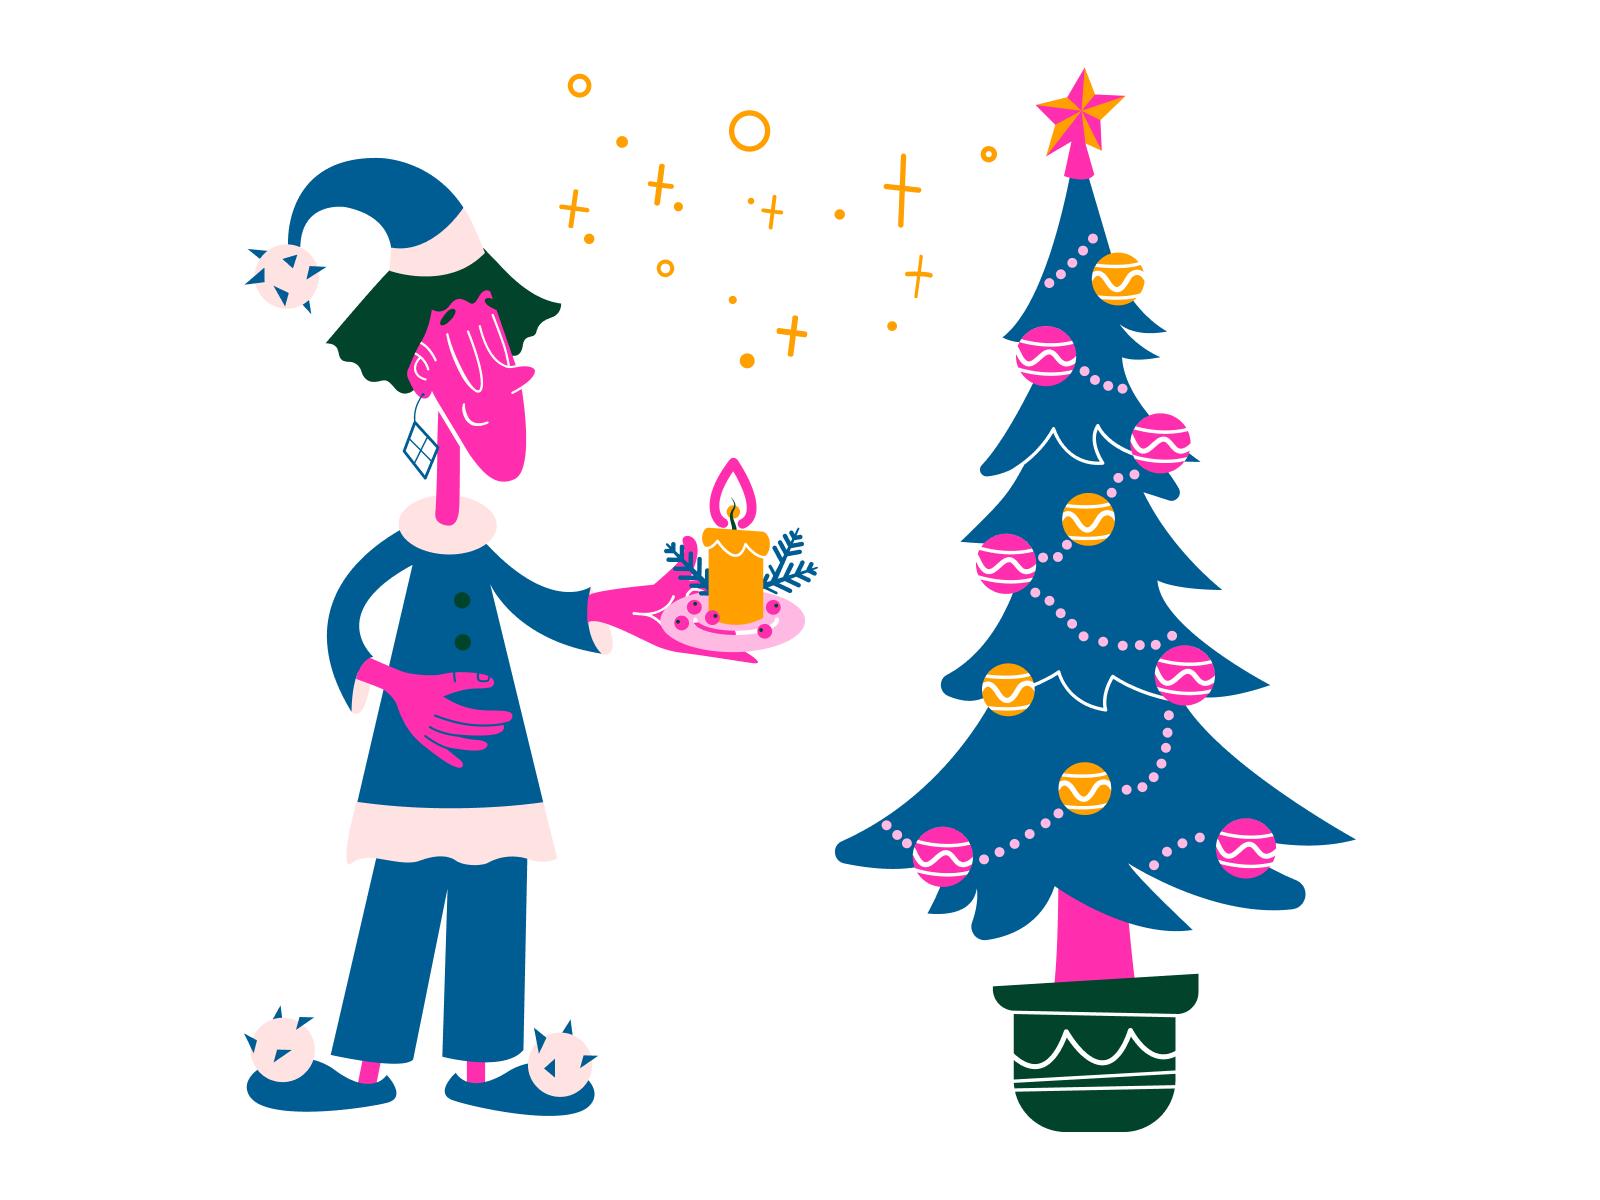 icons8 christmas illustration tree kingdom